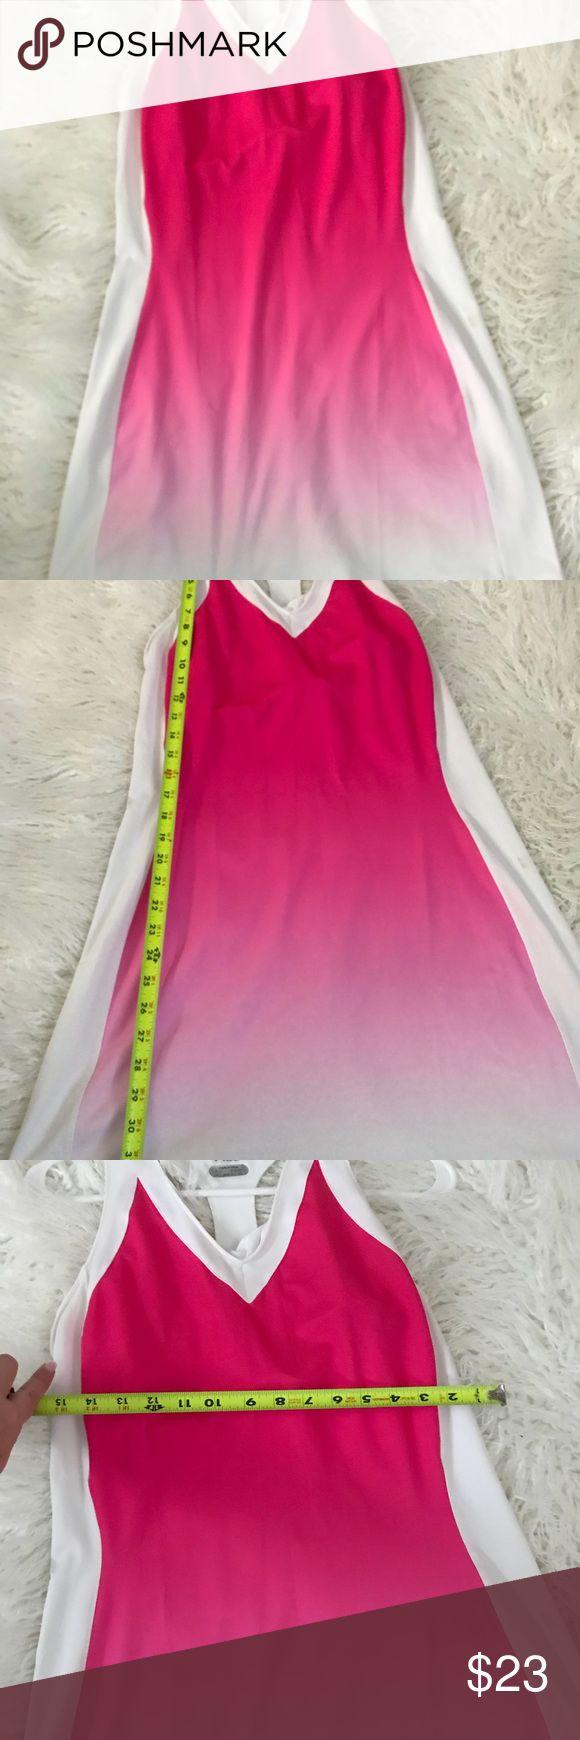 fila sport dress . Perfect for golf or tennis Fila tennis or golf sports dress . Size large . Has built in bra . Super cute ! Fila Dresses Mini -> Für Golf SALE und Golf Bestseller klicken!